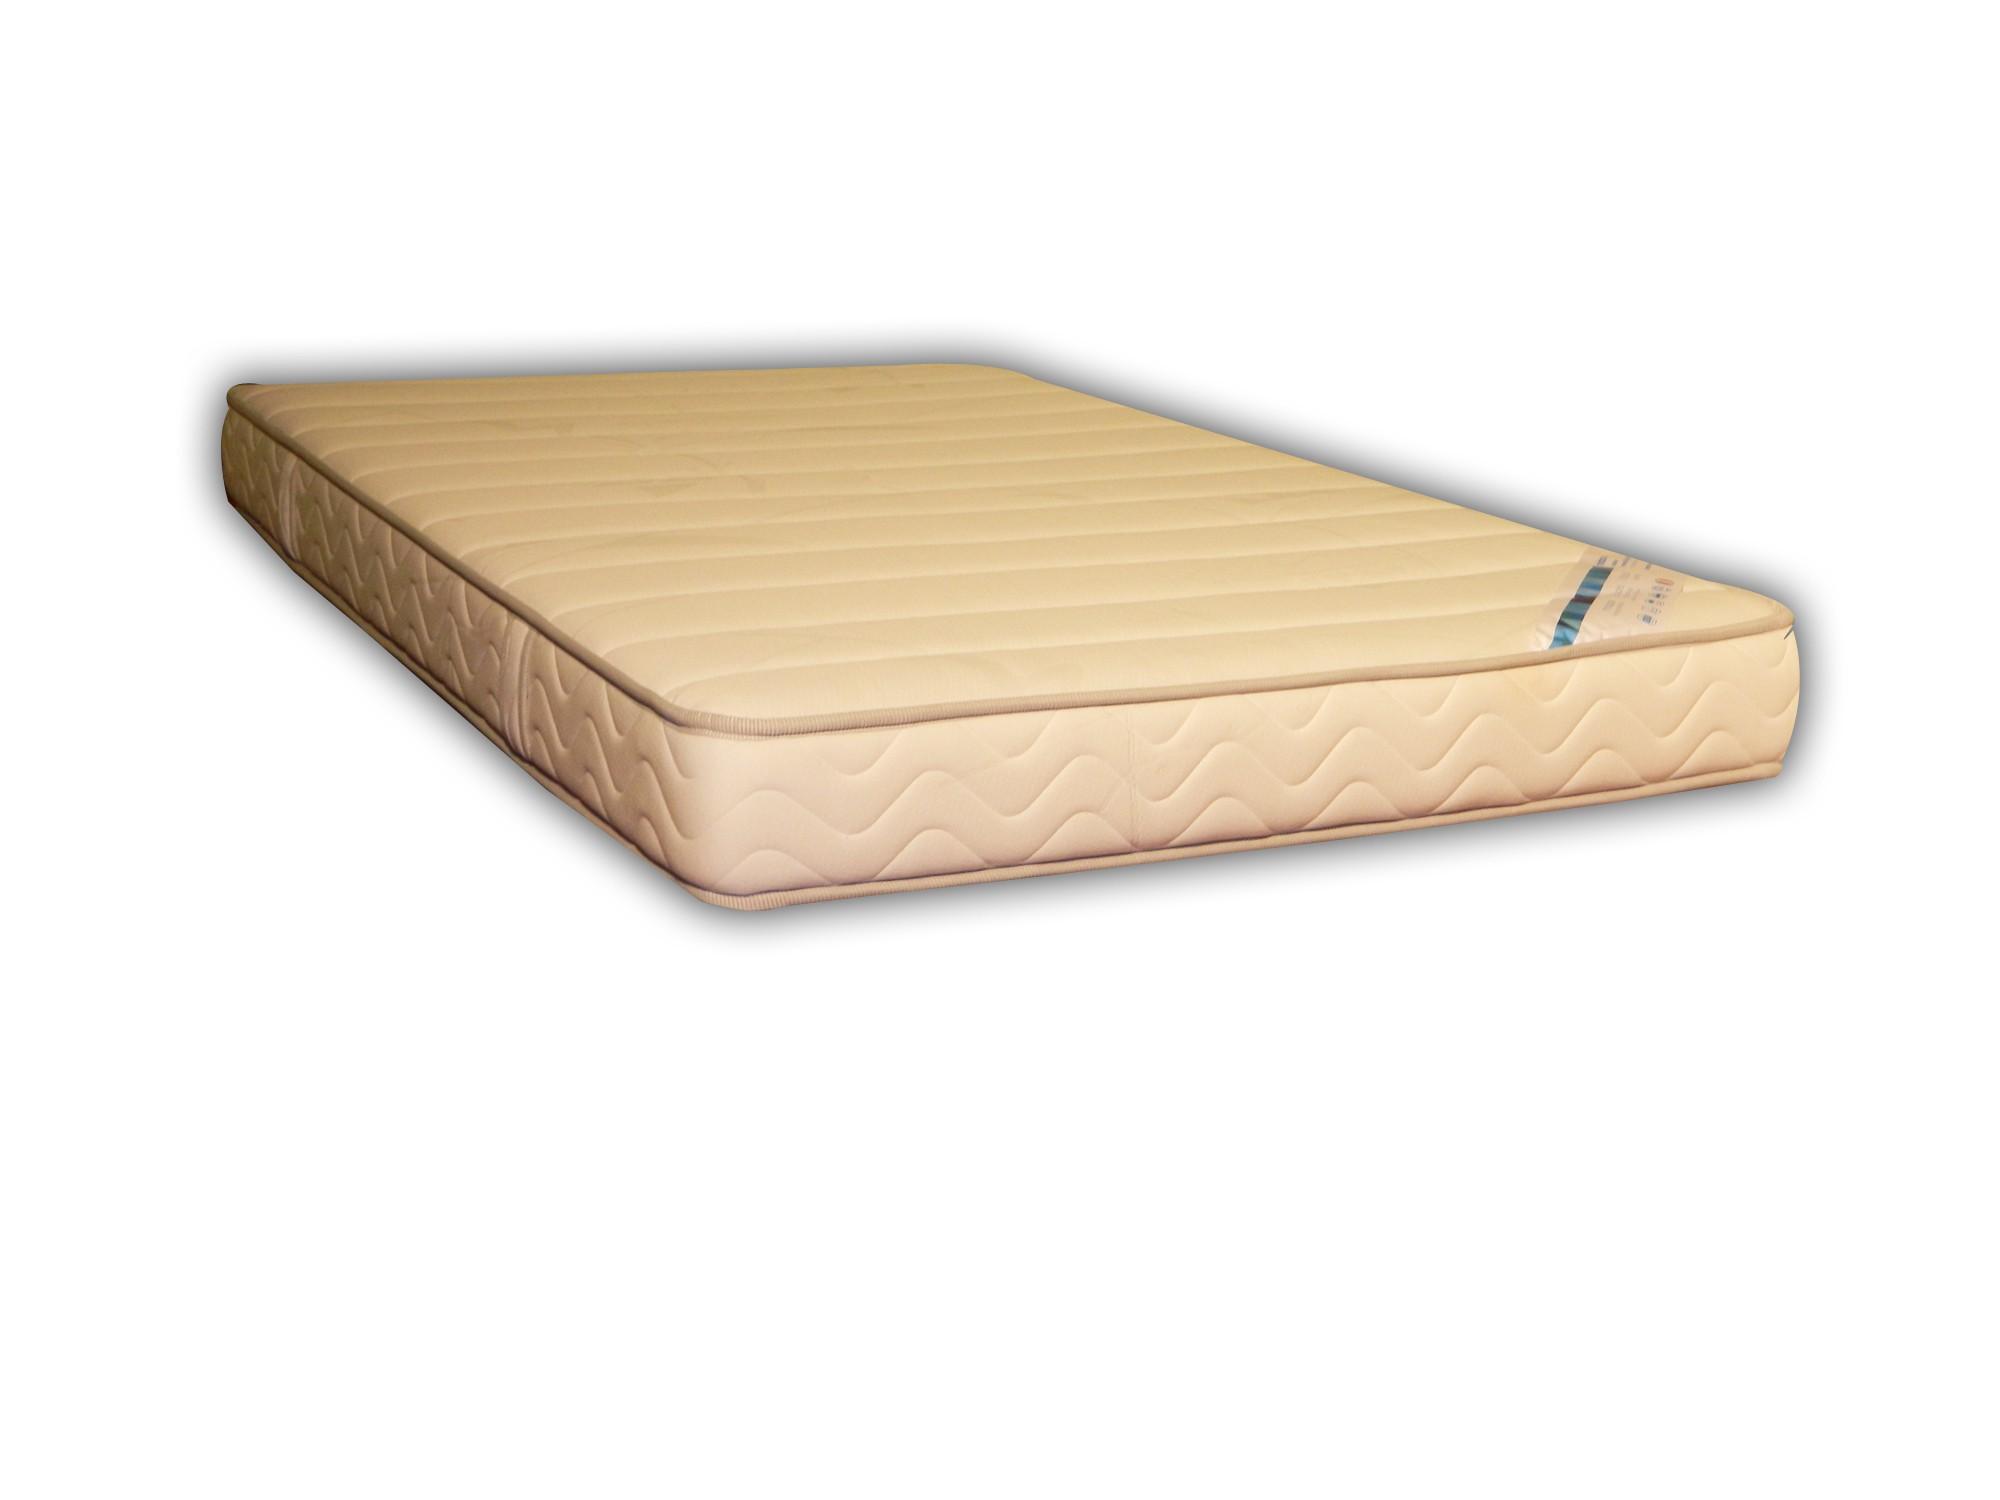 protege matelas 120x190 simple molleton en coton recycl. Black Bedroom Furniture Sets. Home Design Ideas